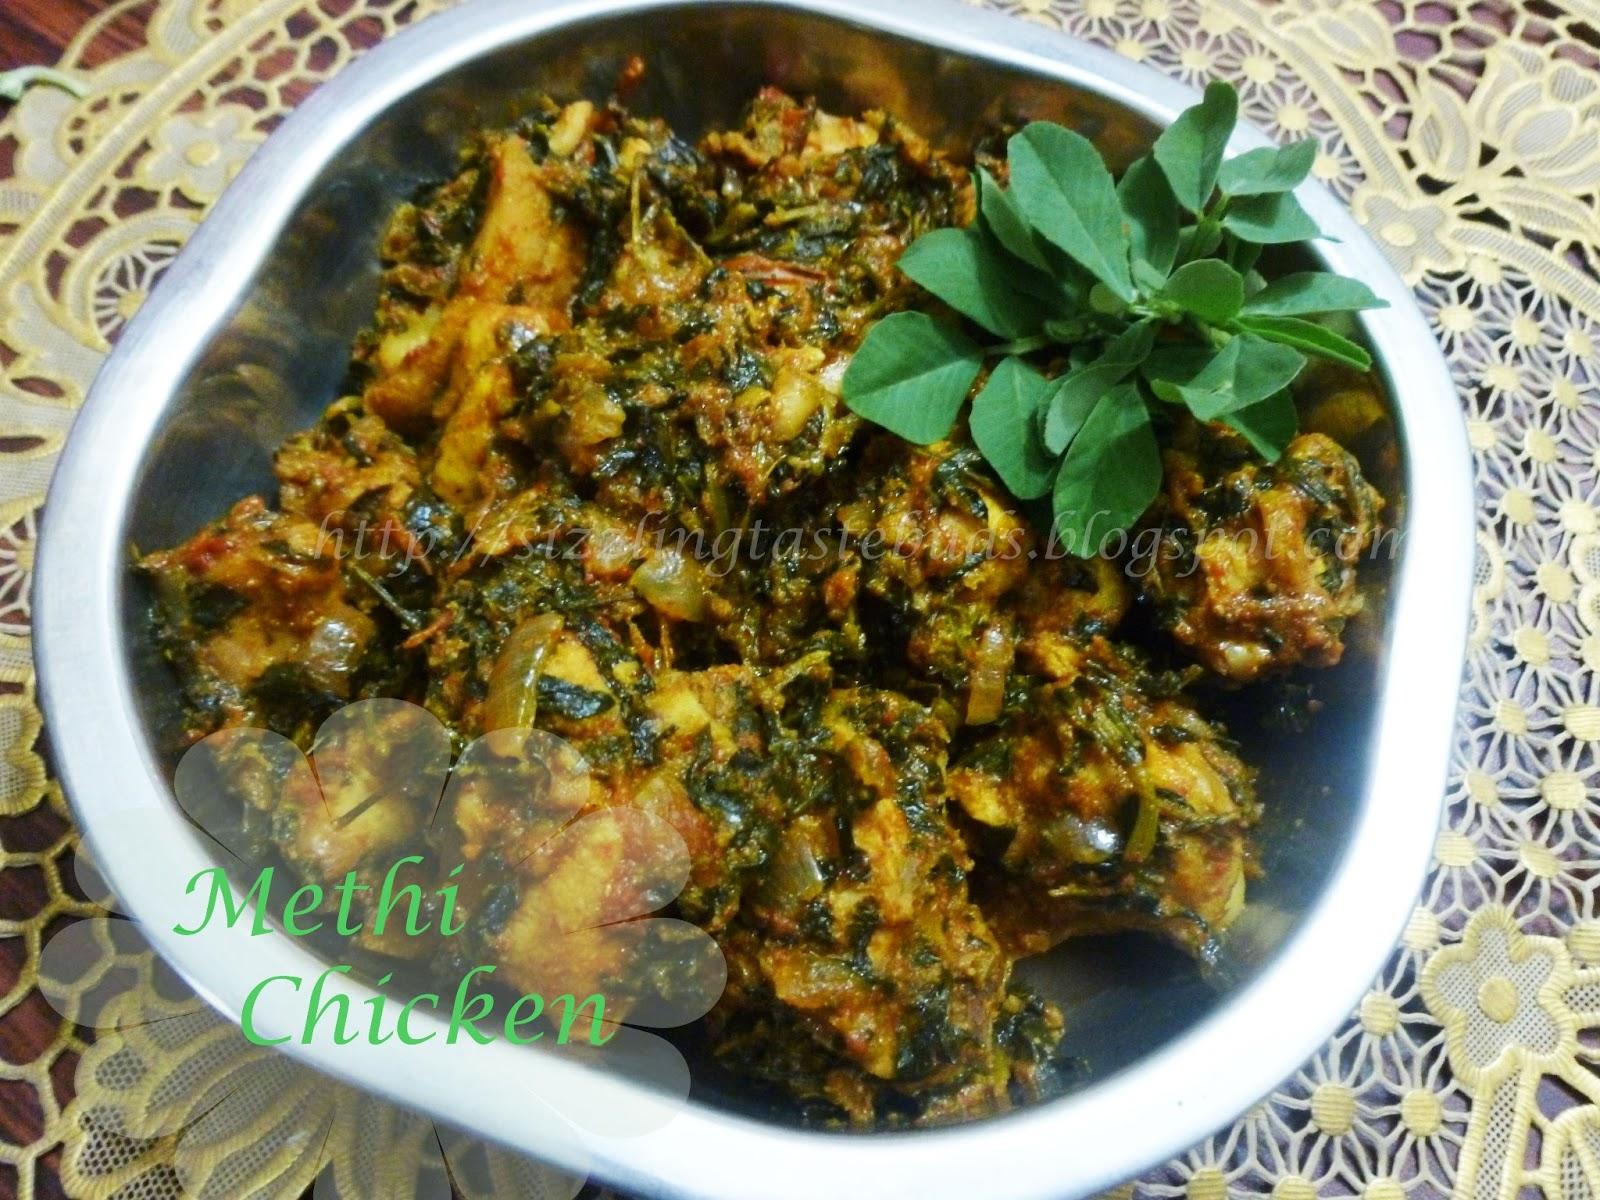 Chicken With Fenugreek Leaves / Methi Chicken / Methi Murgh